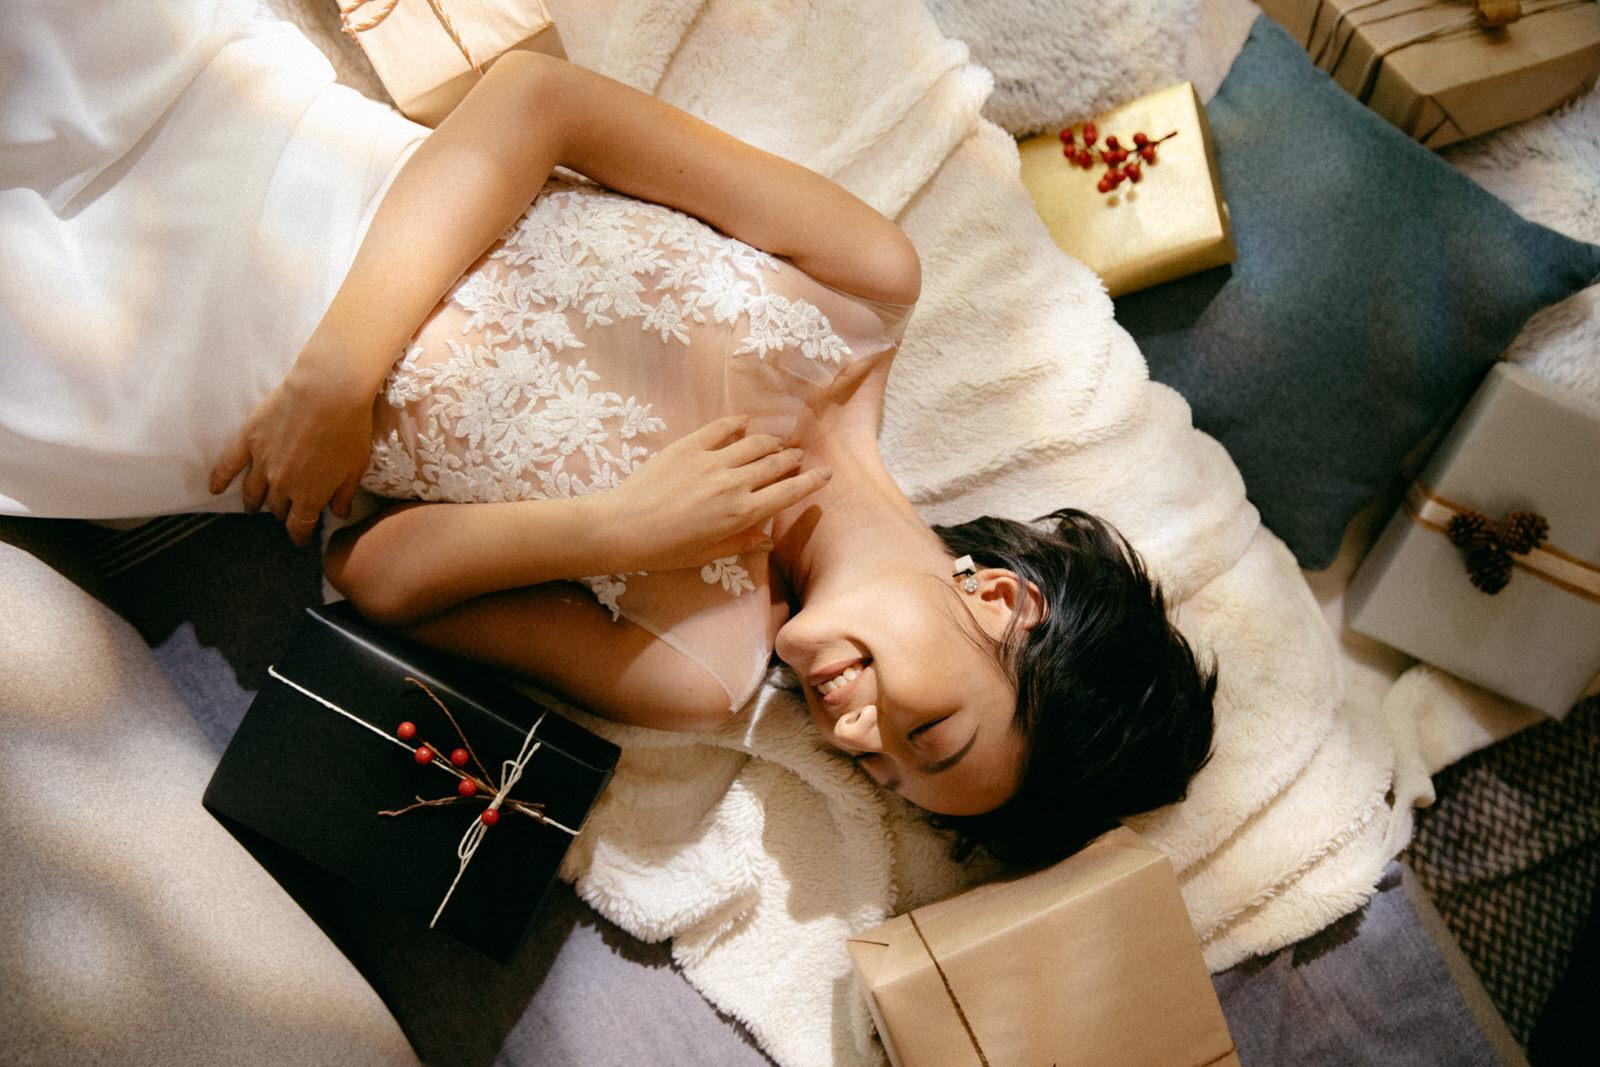 NW-076_Lace Bodysuit & NW-060_Chiffon 1/2 Circular Skirt